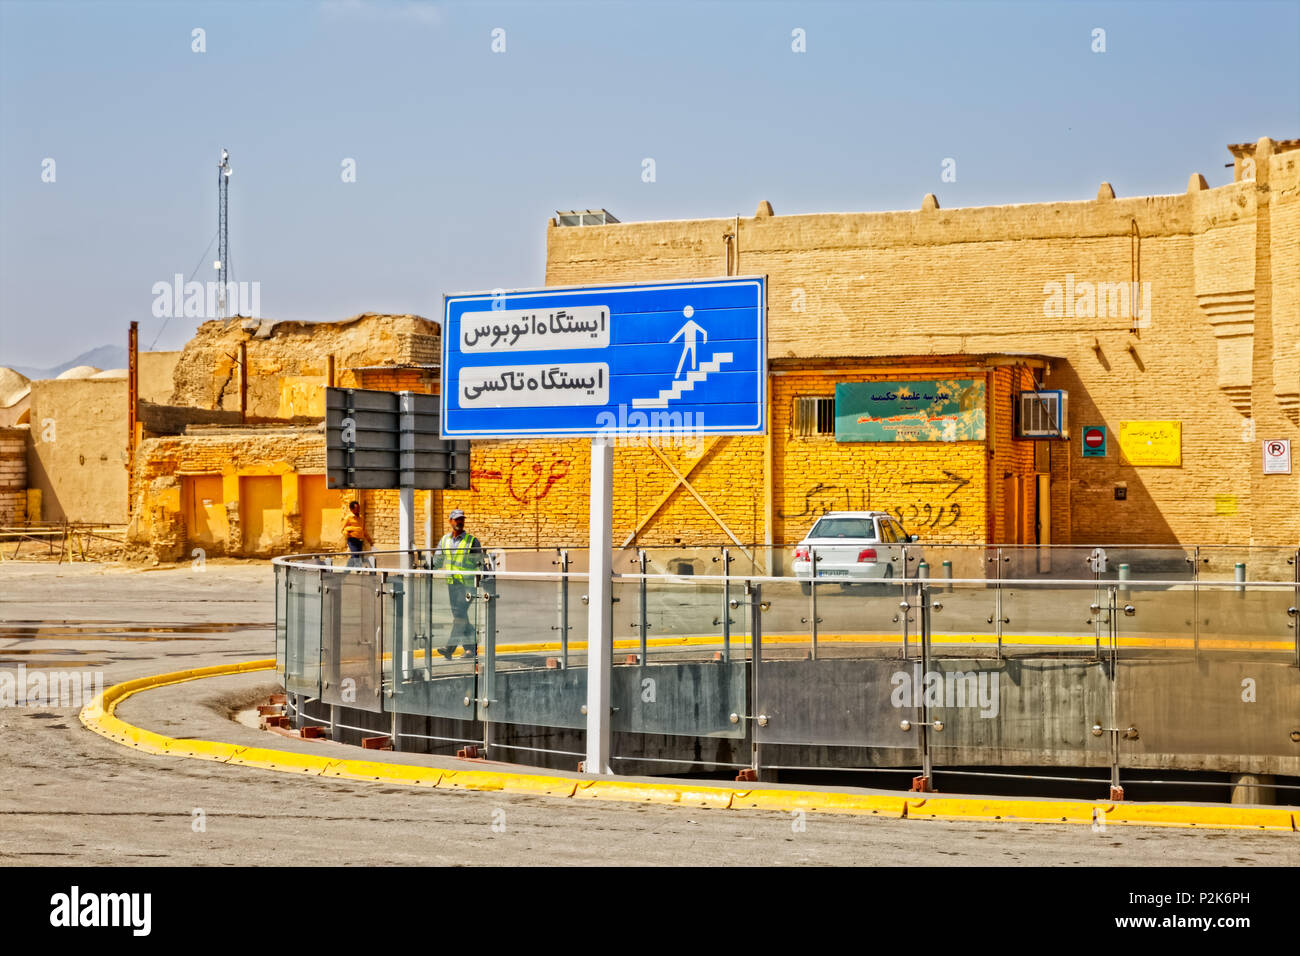 Isfahan street sign - Stock Image